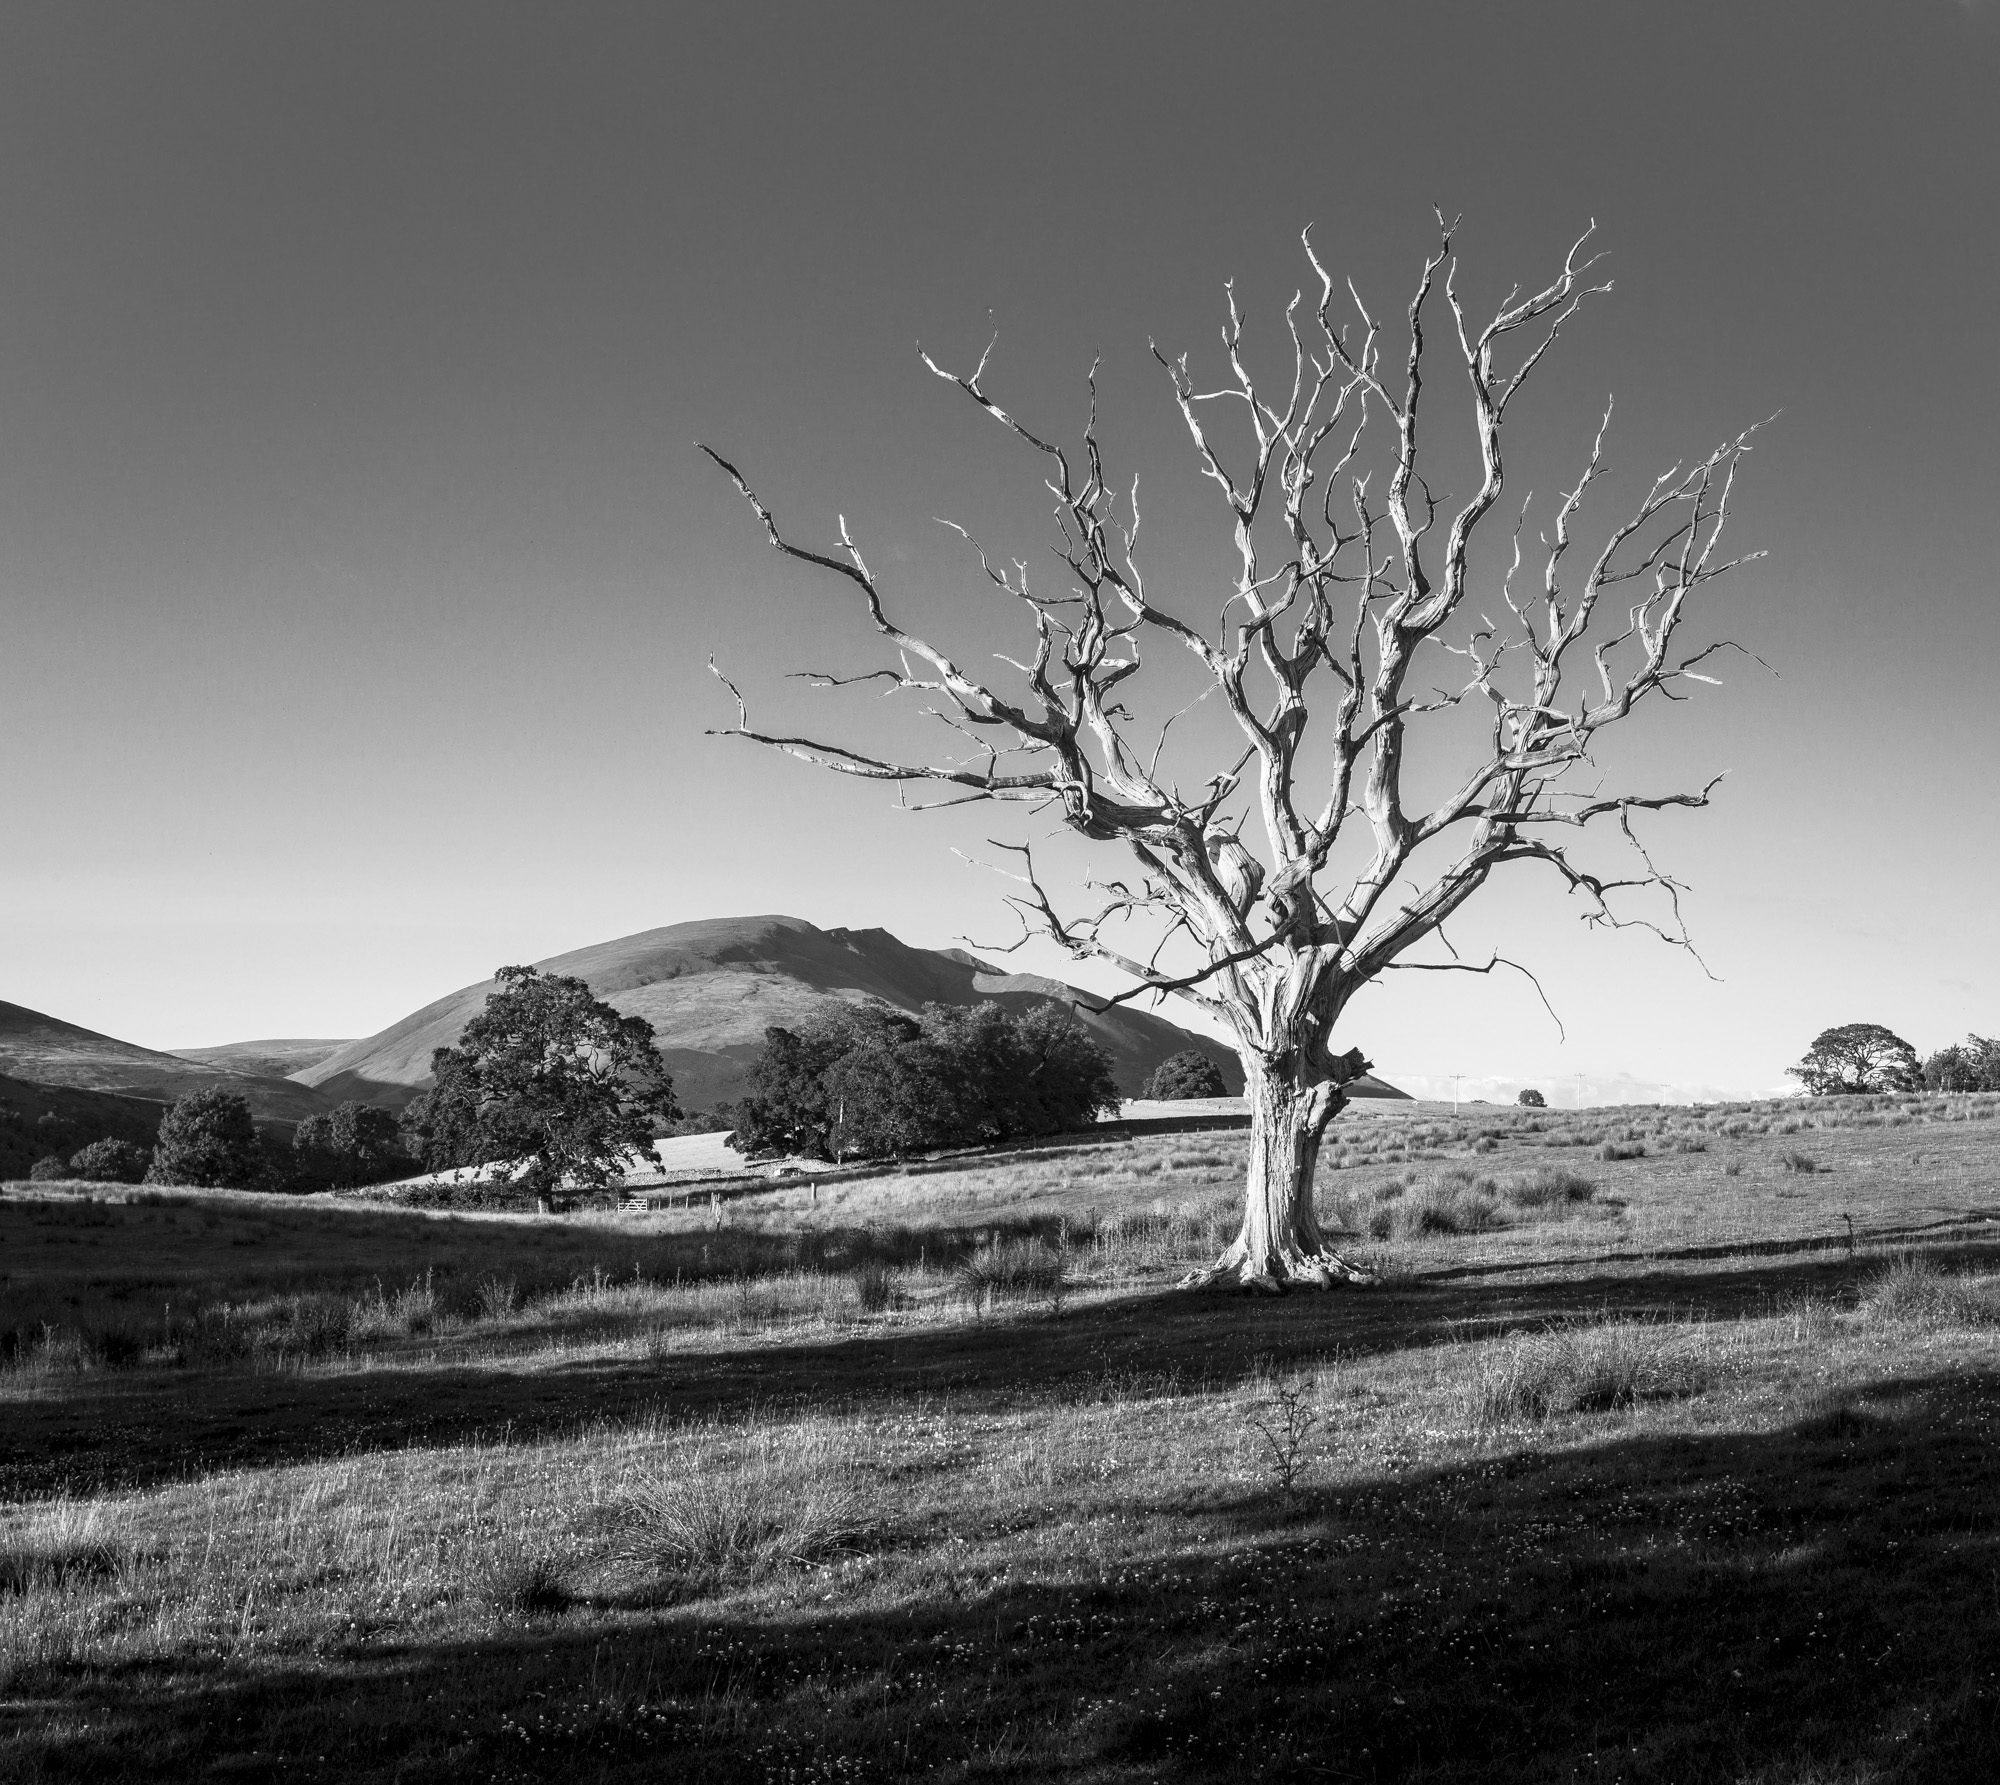 ©_Mark_Maio_2015_Lone _Tree.jpg